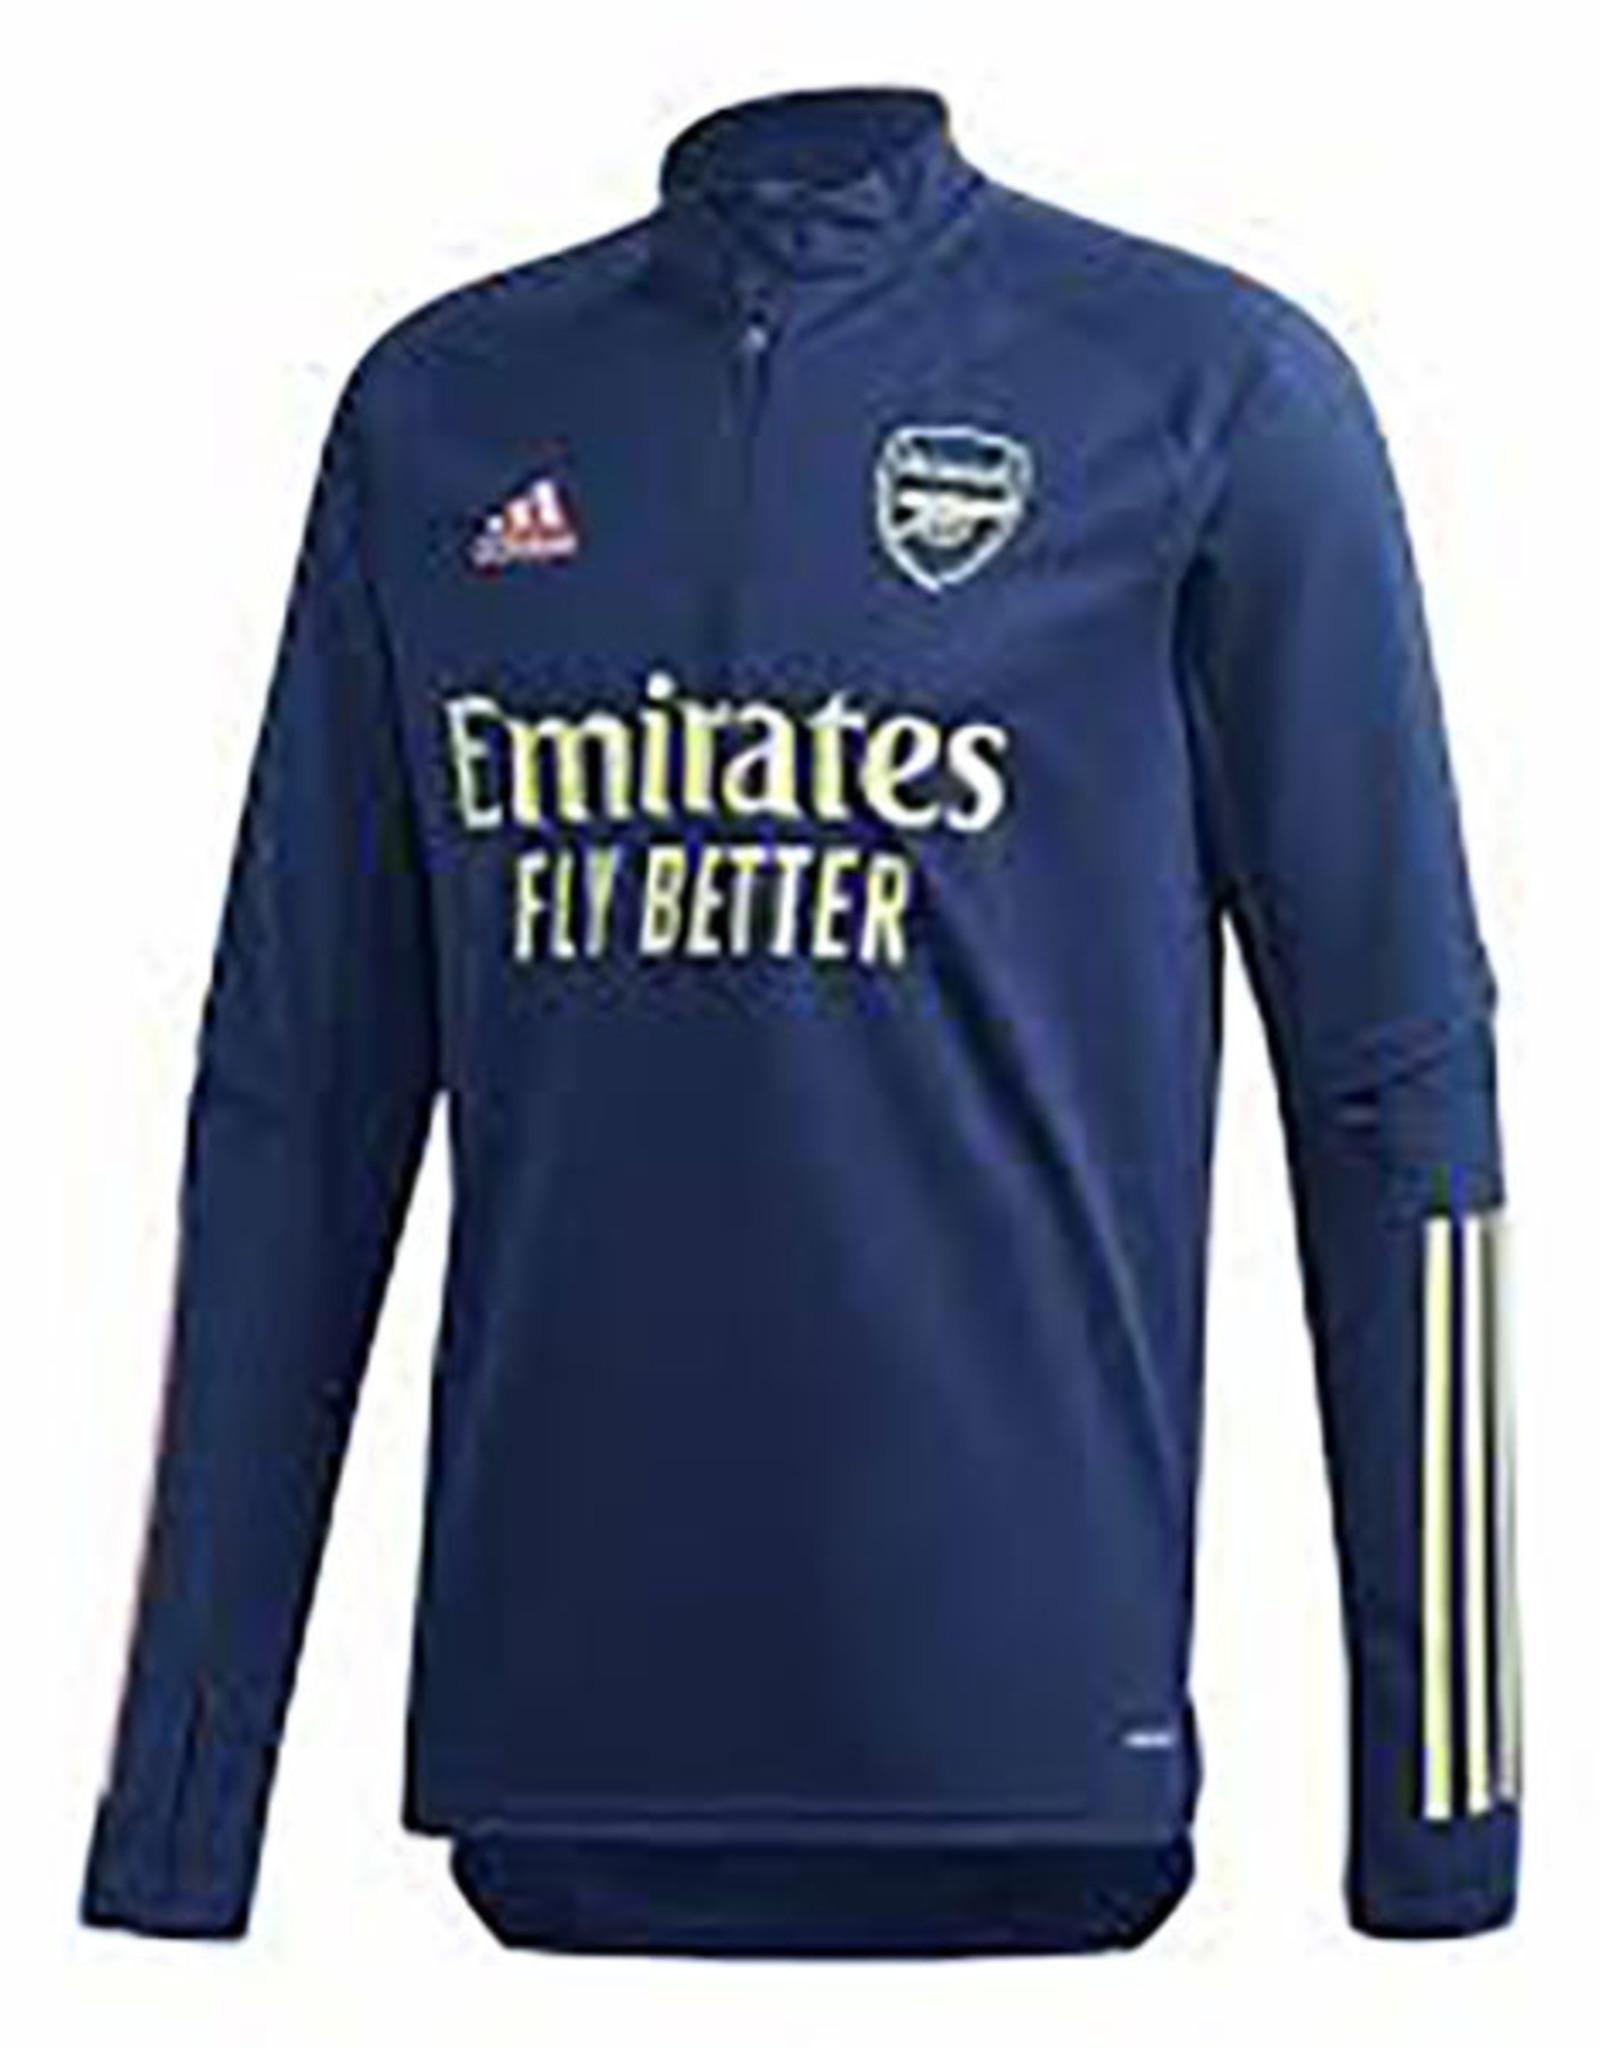 Adidas Trainingstrui Arsenal